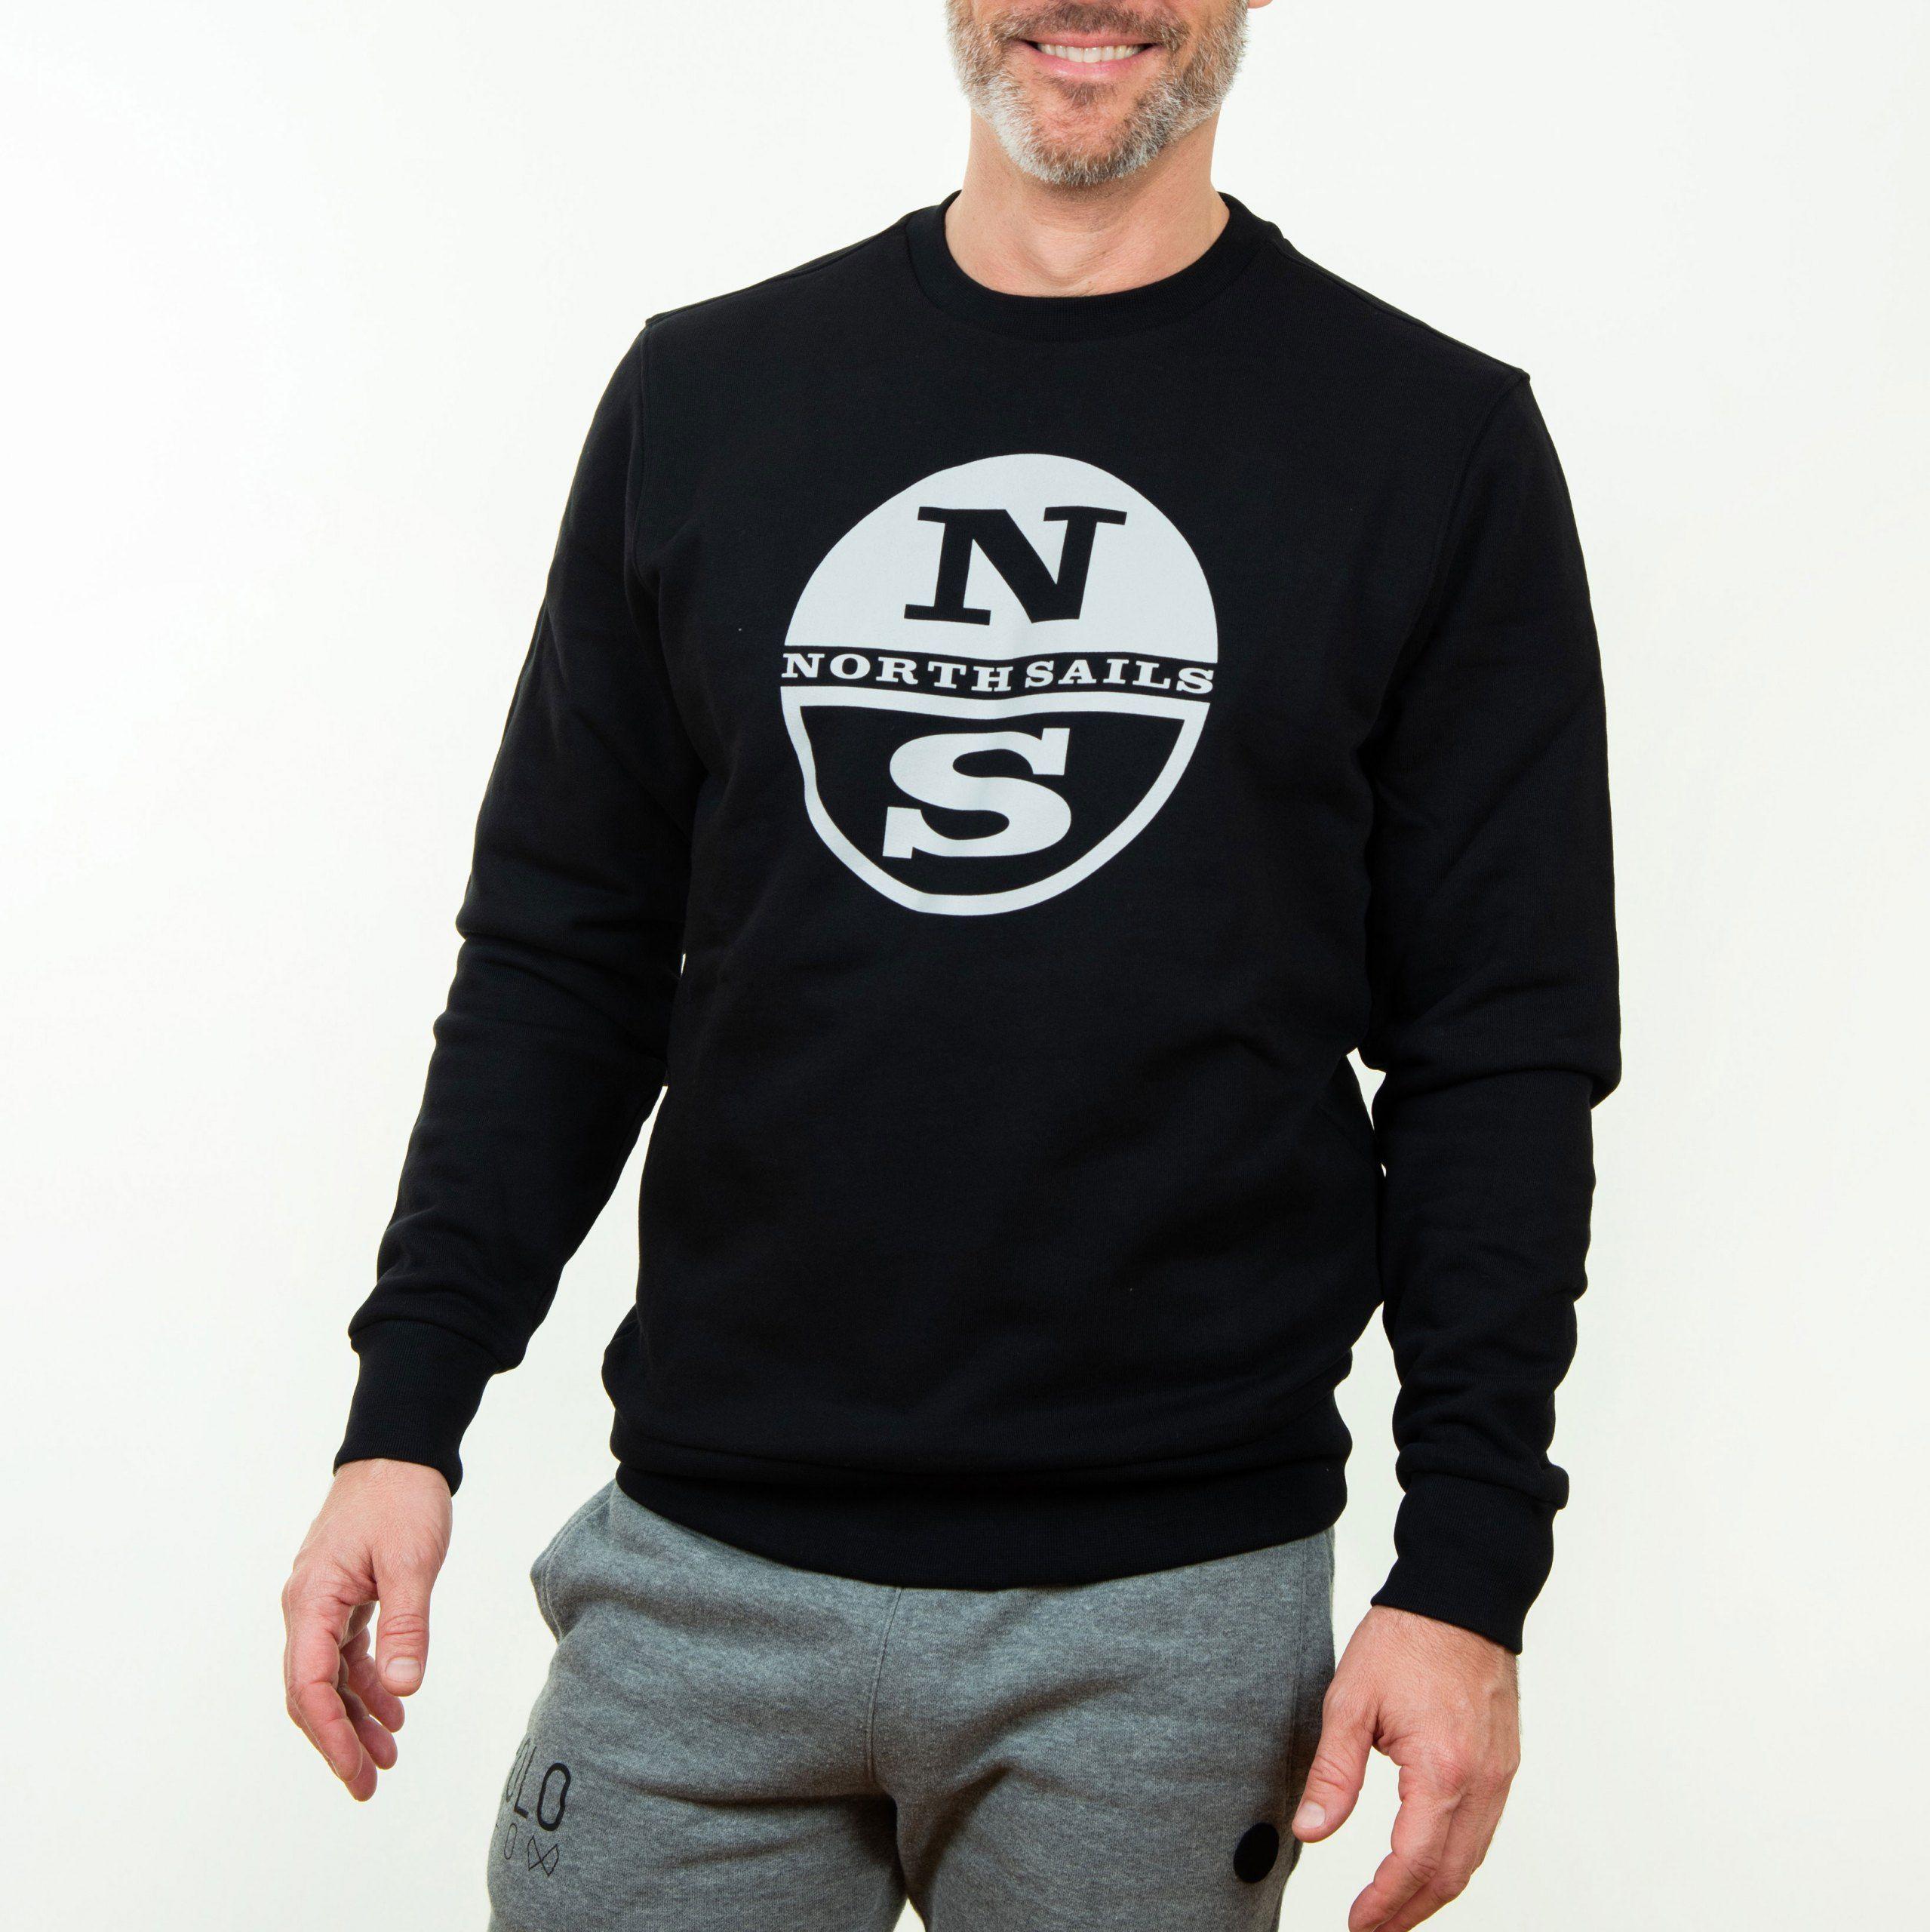 Poloshow North Sails Sweatshirt Dunkelblau Graphic 691542 000 0999 500 5 5